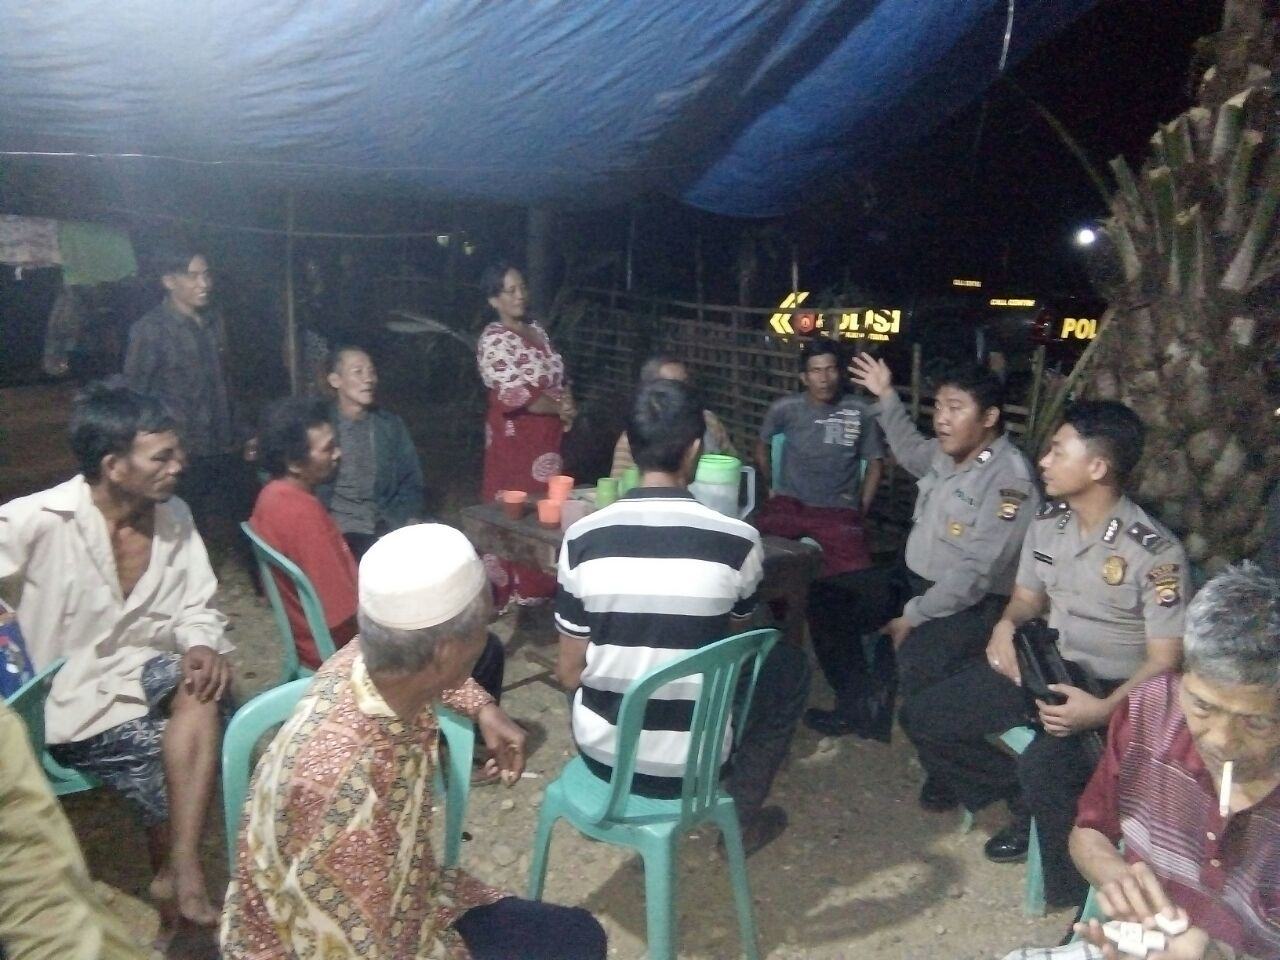 Sambut Ramadhan, Polsek Kaur Utara Himbau Warga Tingkatkan Keamanan